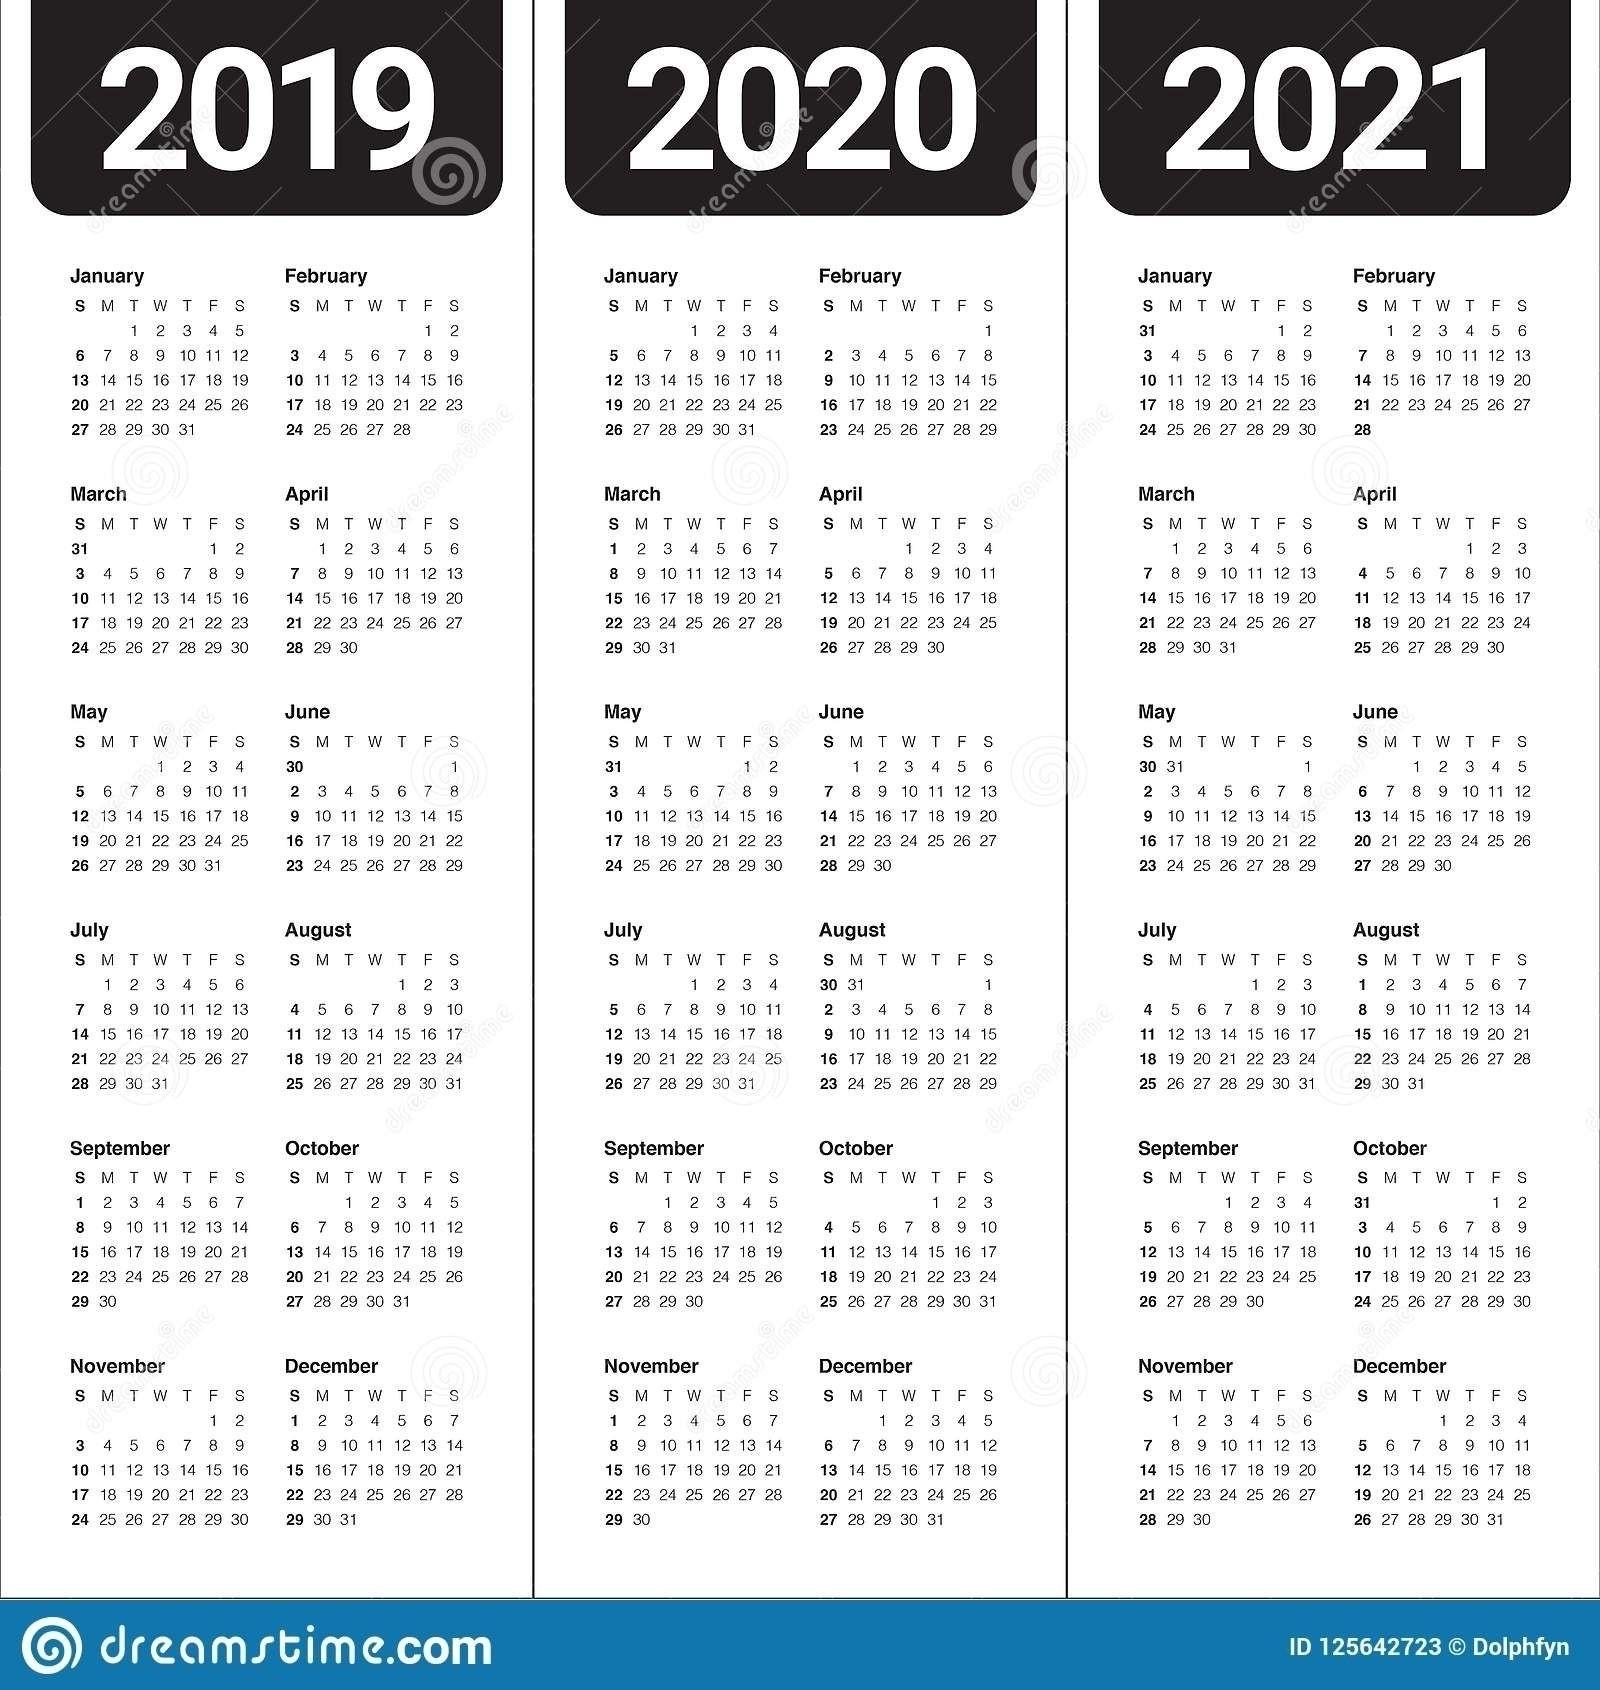 Depo Provera Calendar 2021 Calculator - Template Calendar Design